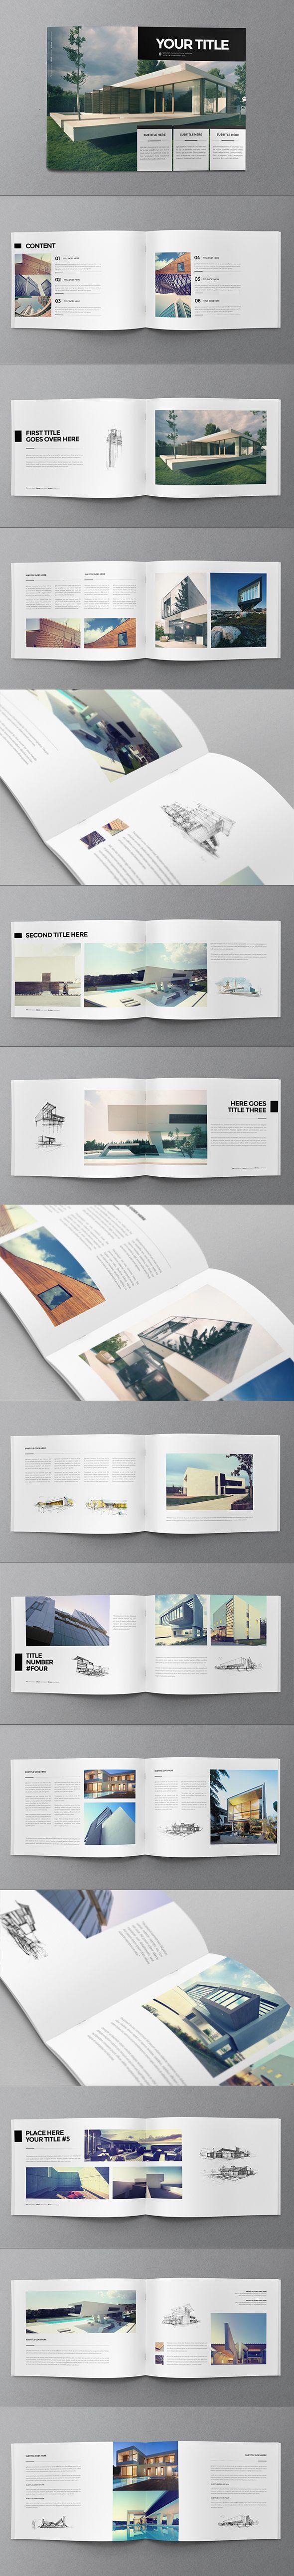 Minimal architecture brochure template.